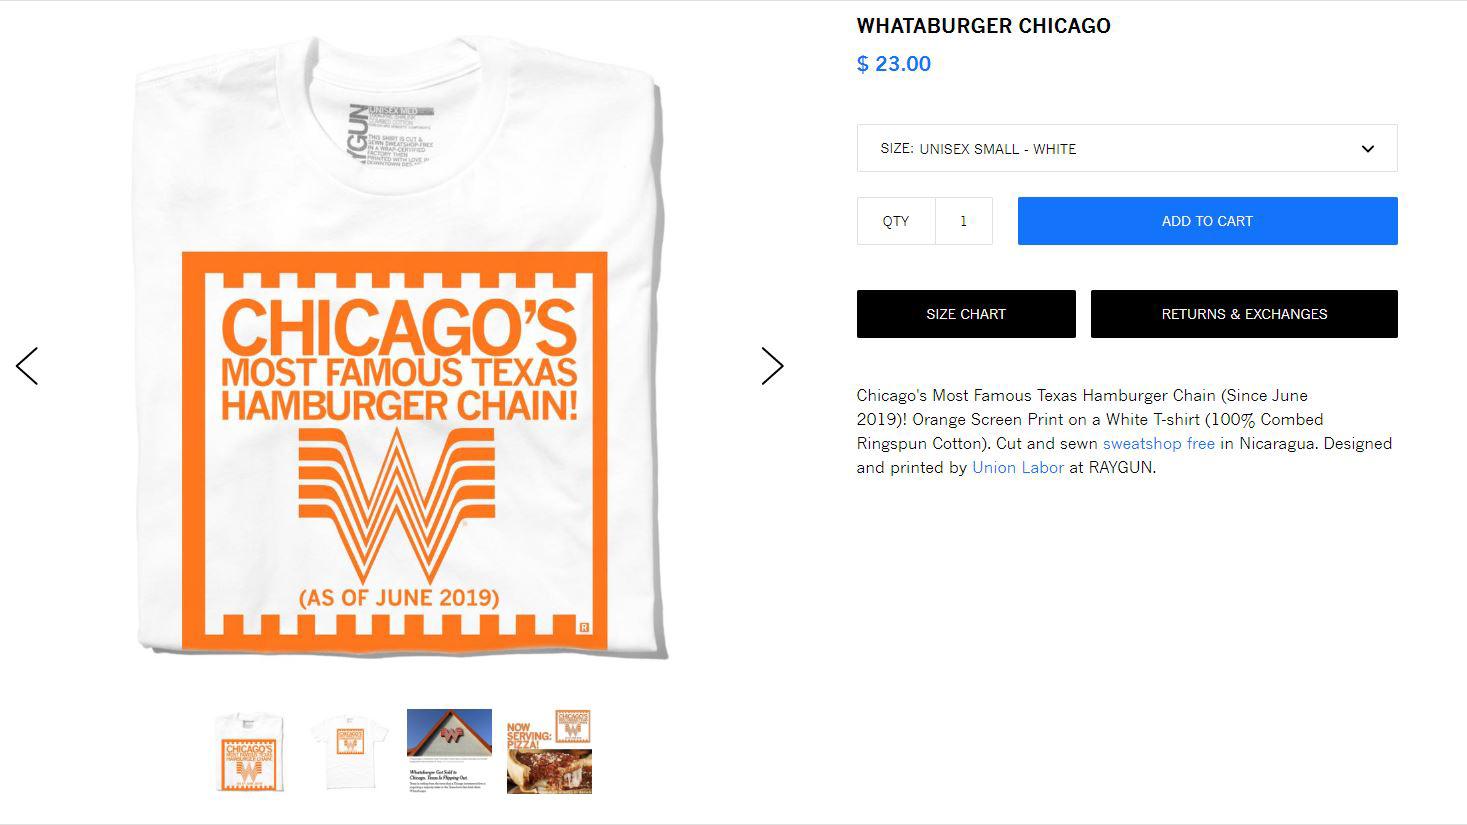 J J  Watt rallies Texans to buy Whataburger back from